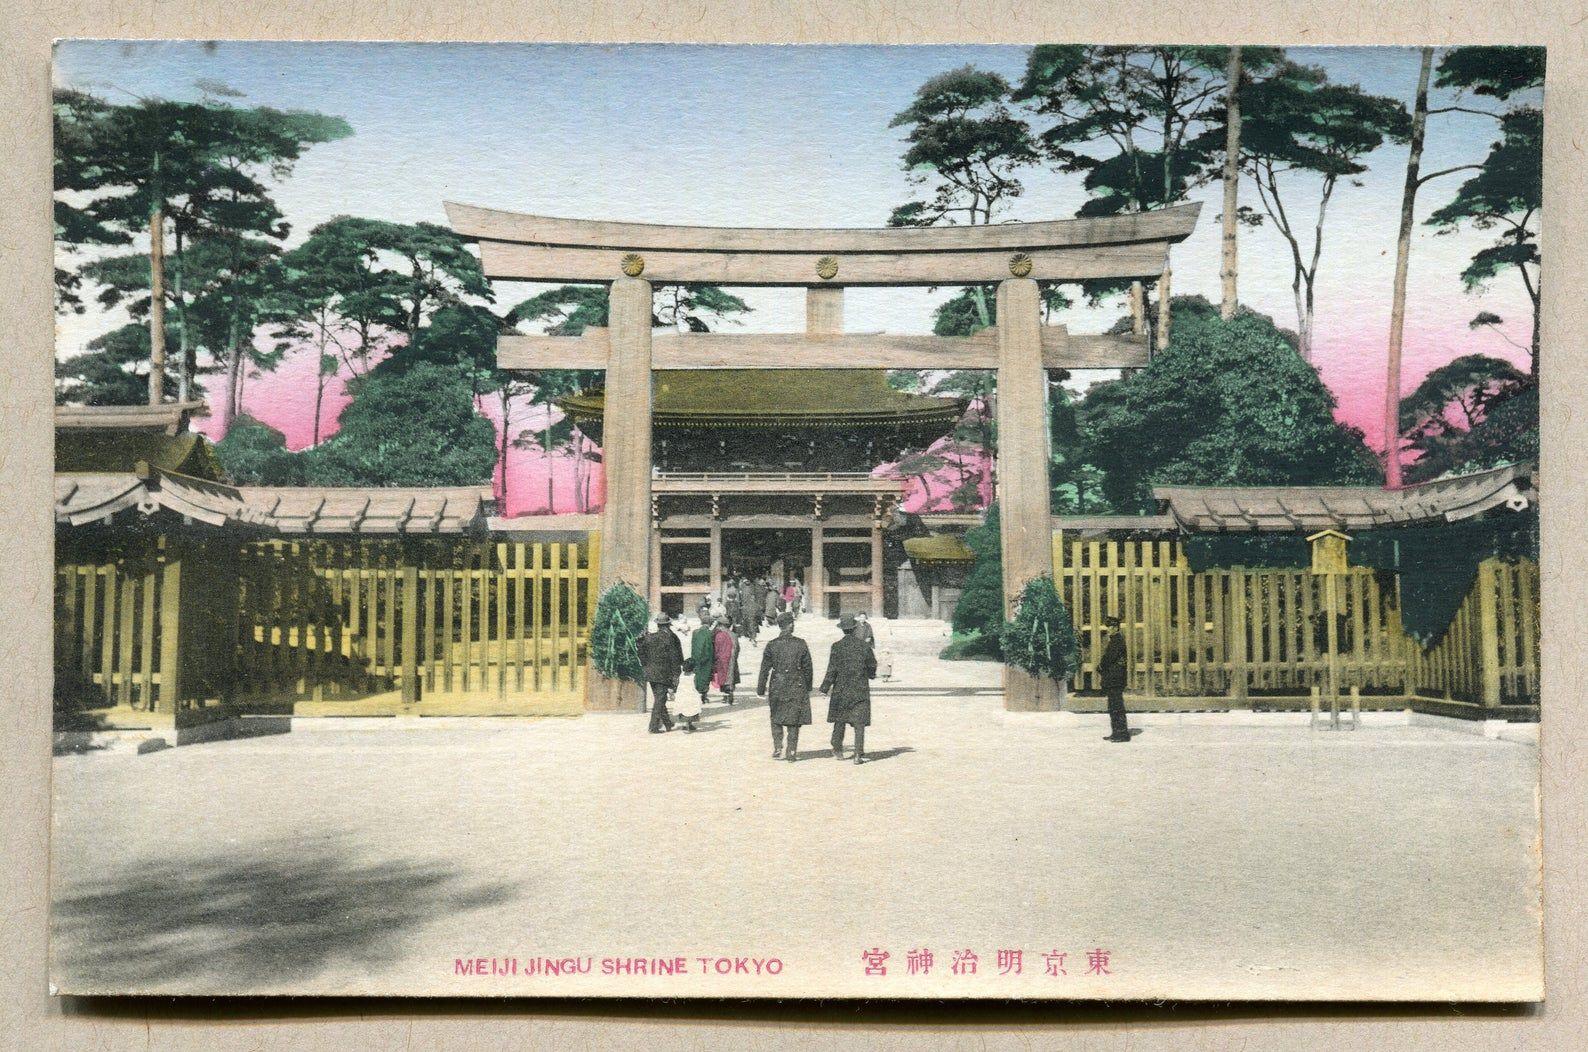 Vintage Meiji Jingu Shrine Tokyo Postcard in 2020